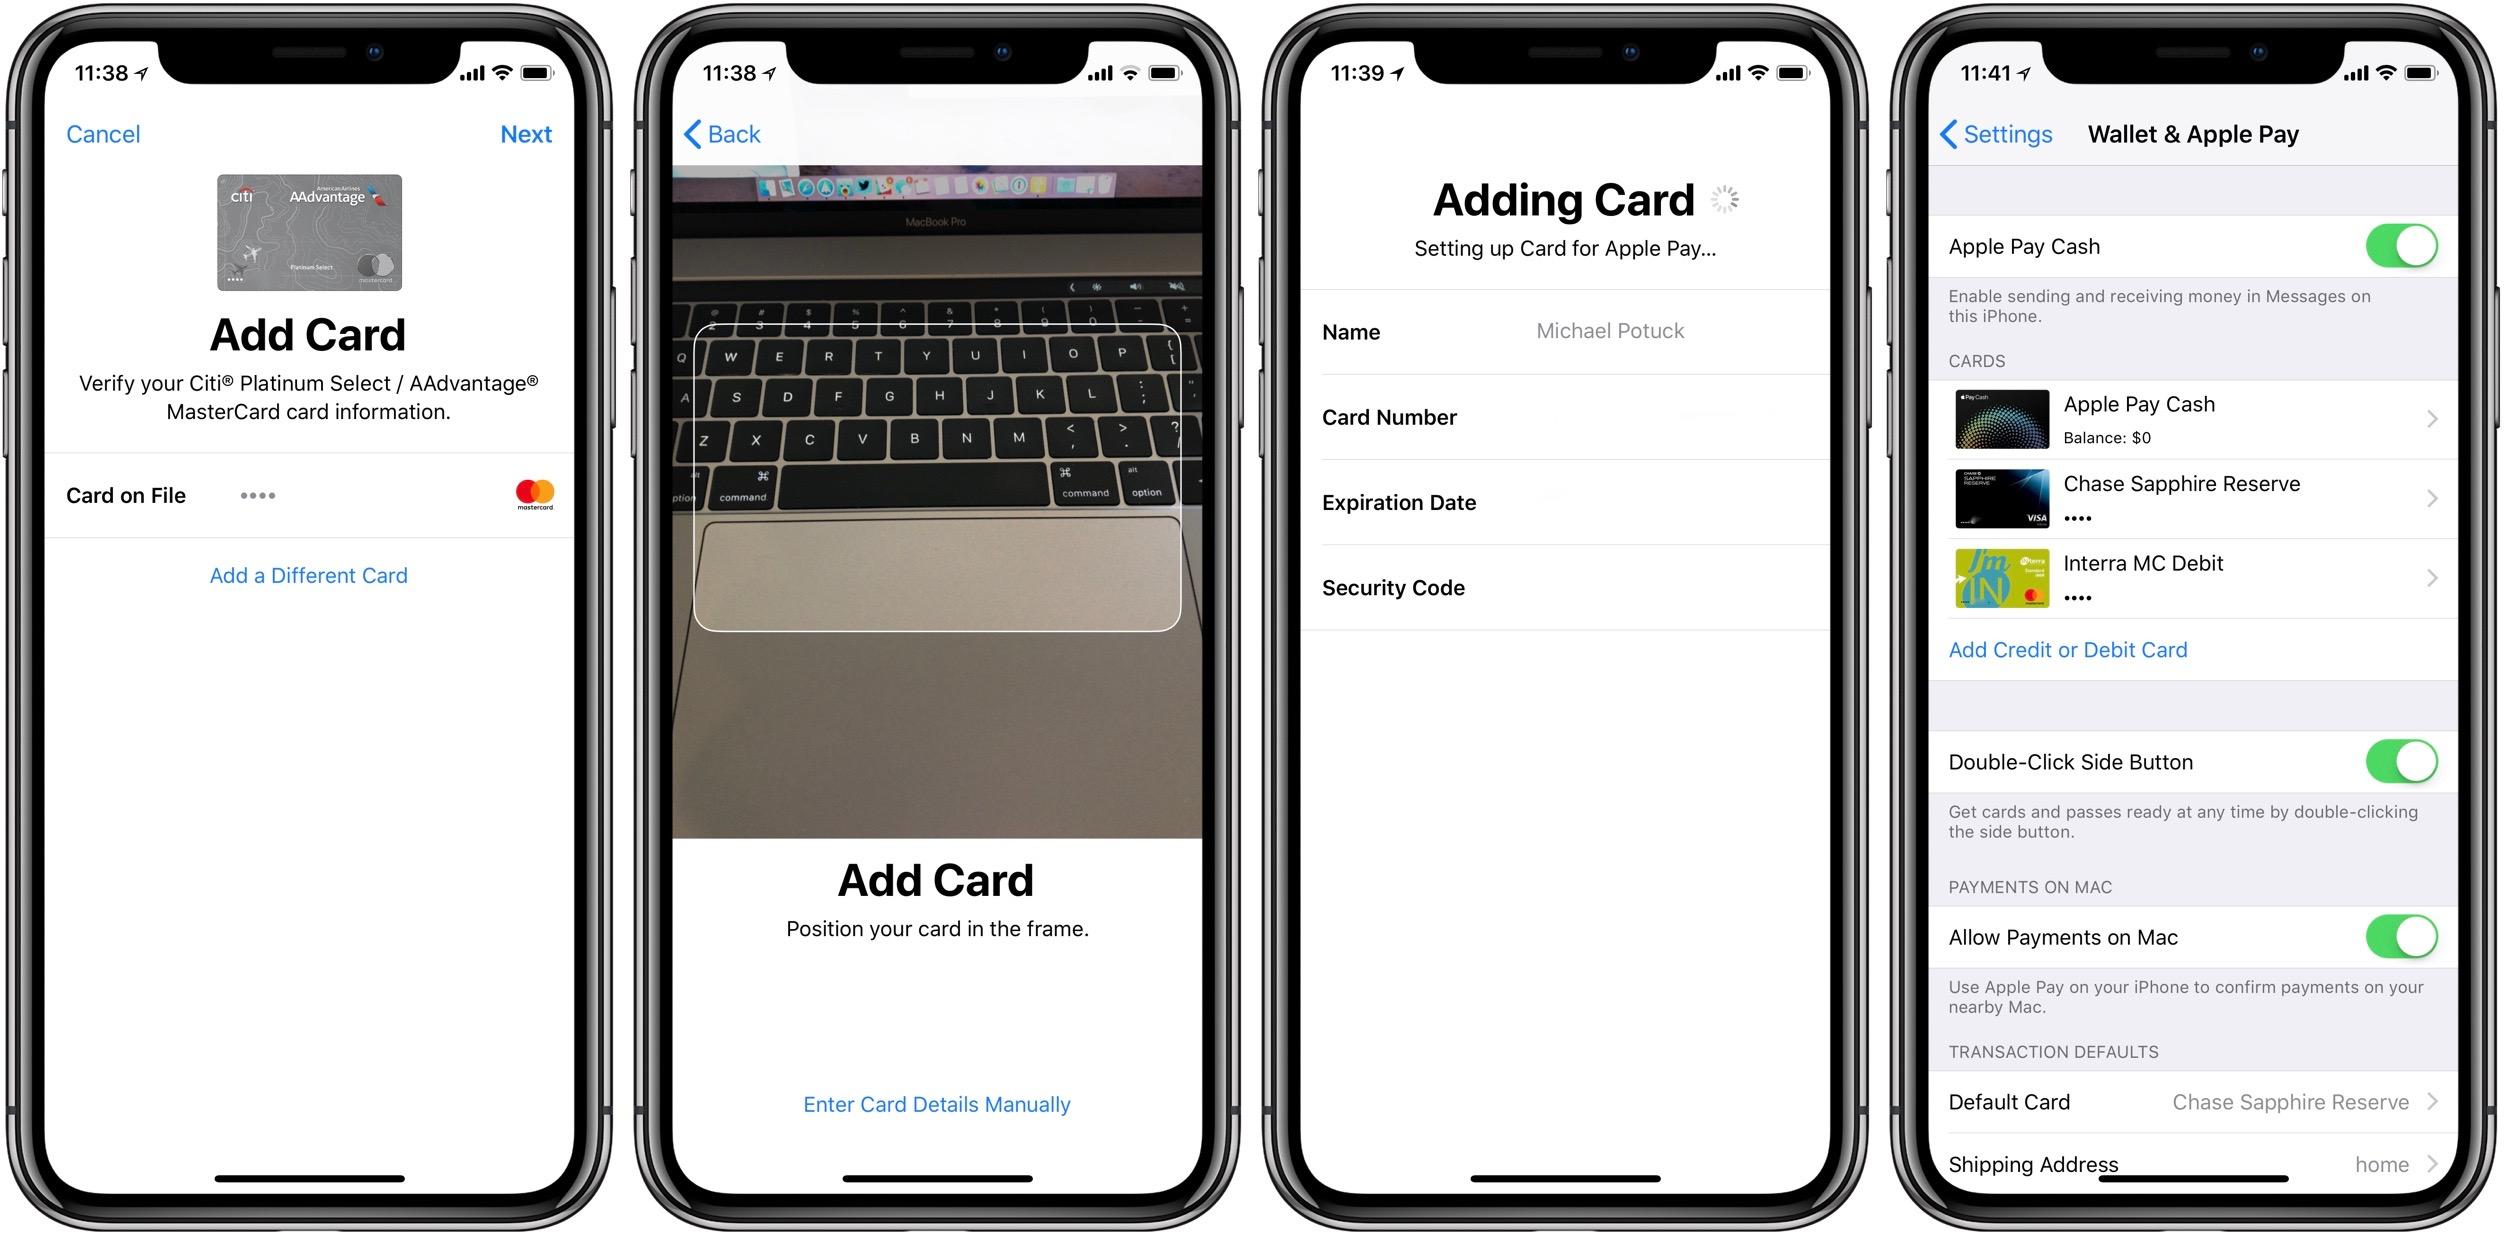 Apple Pay cash walkthrough 2